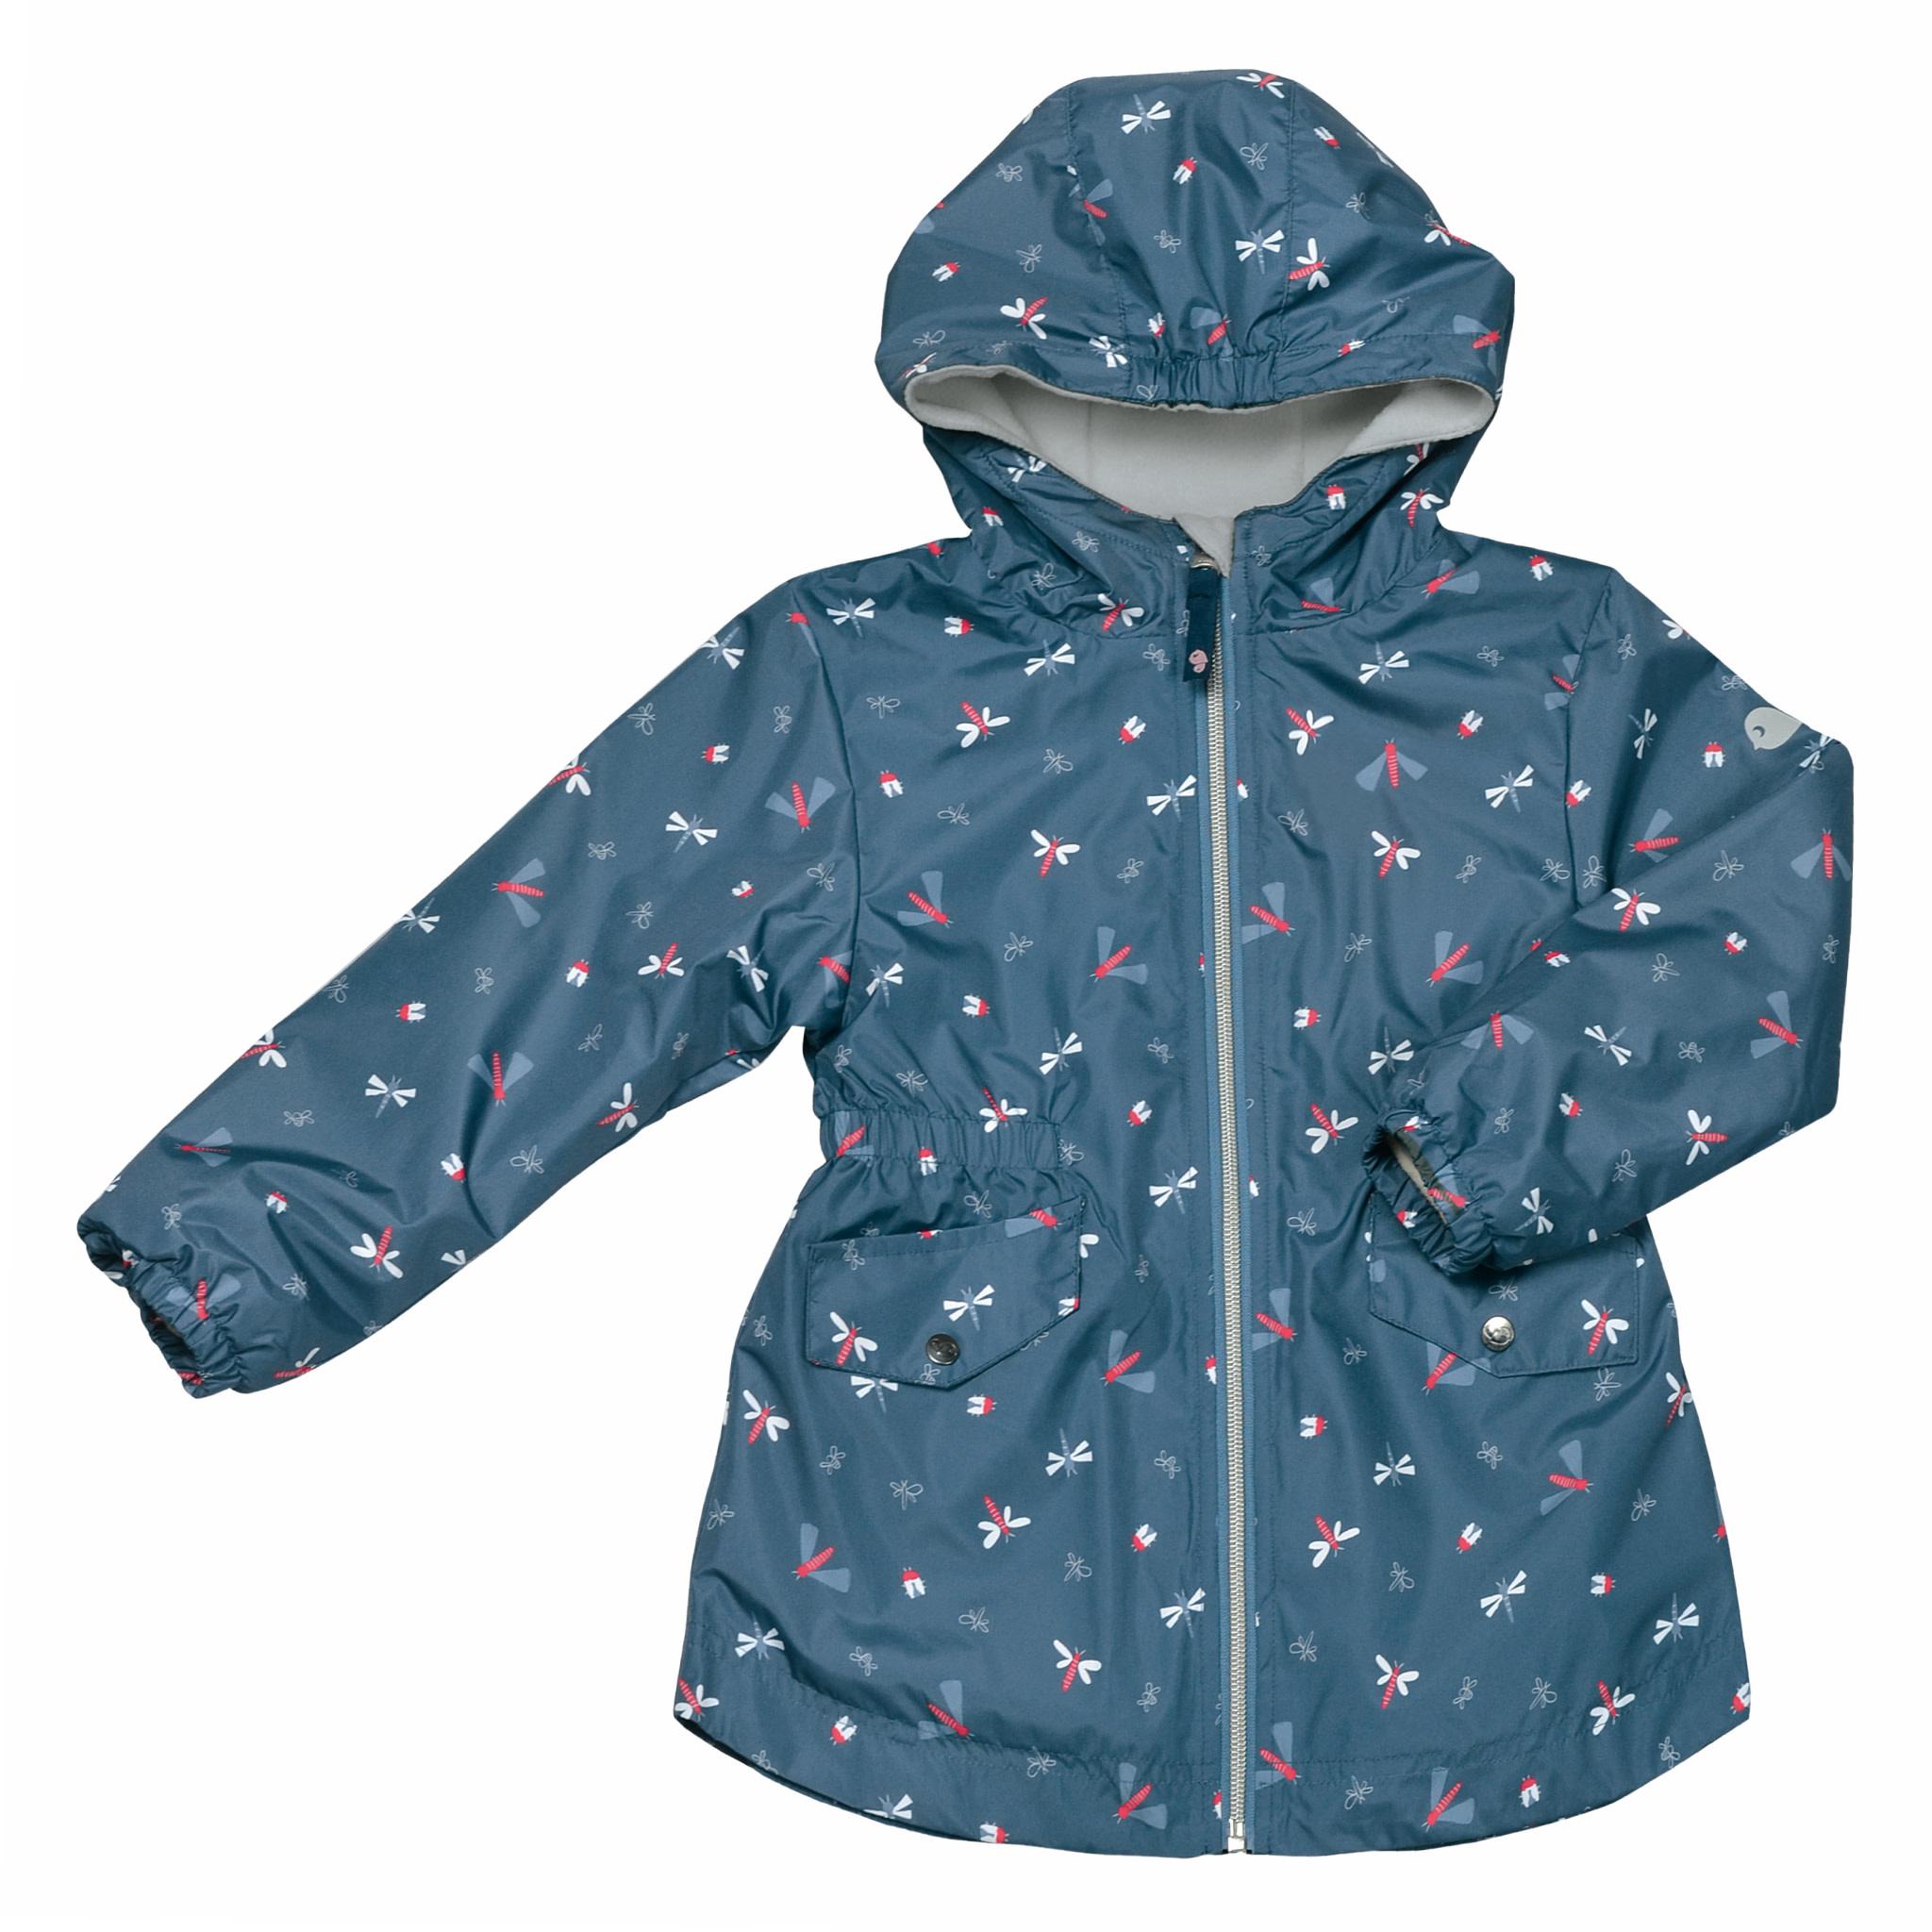 Manteau mi-saison - Libellules  Bleu-1